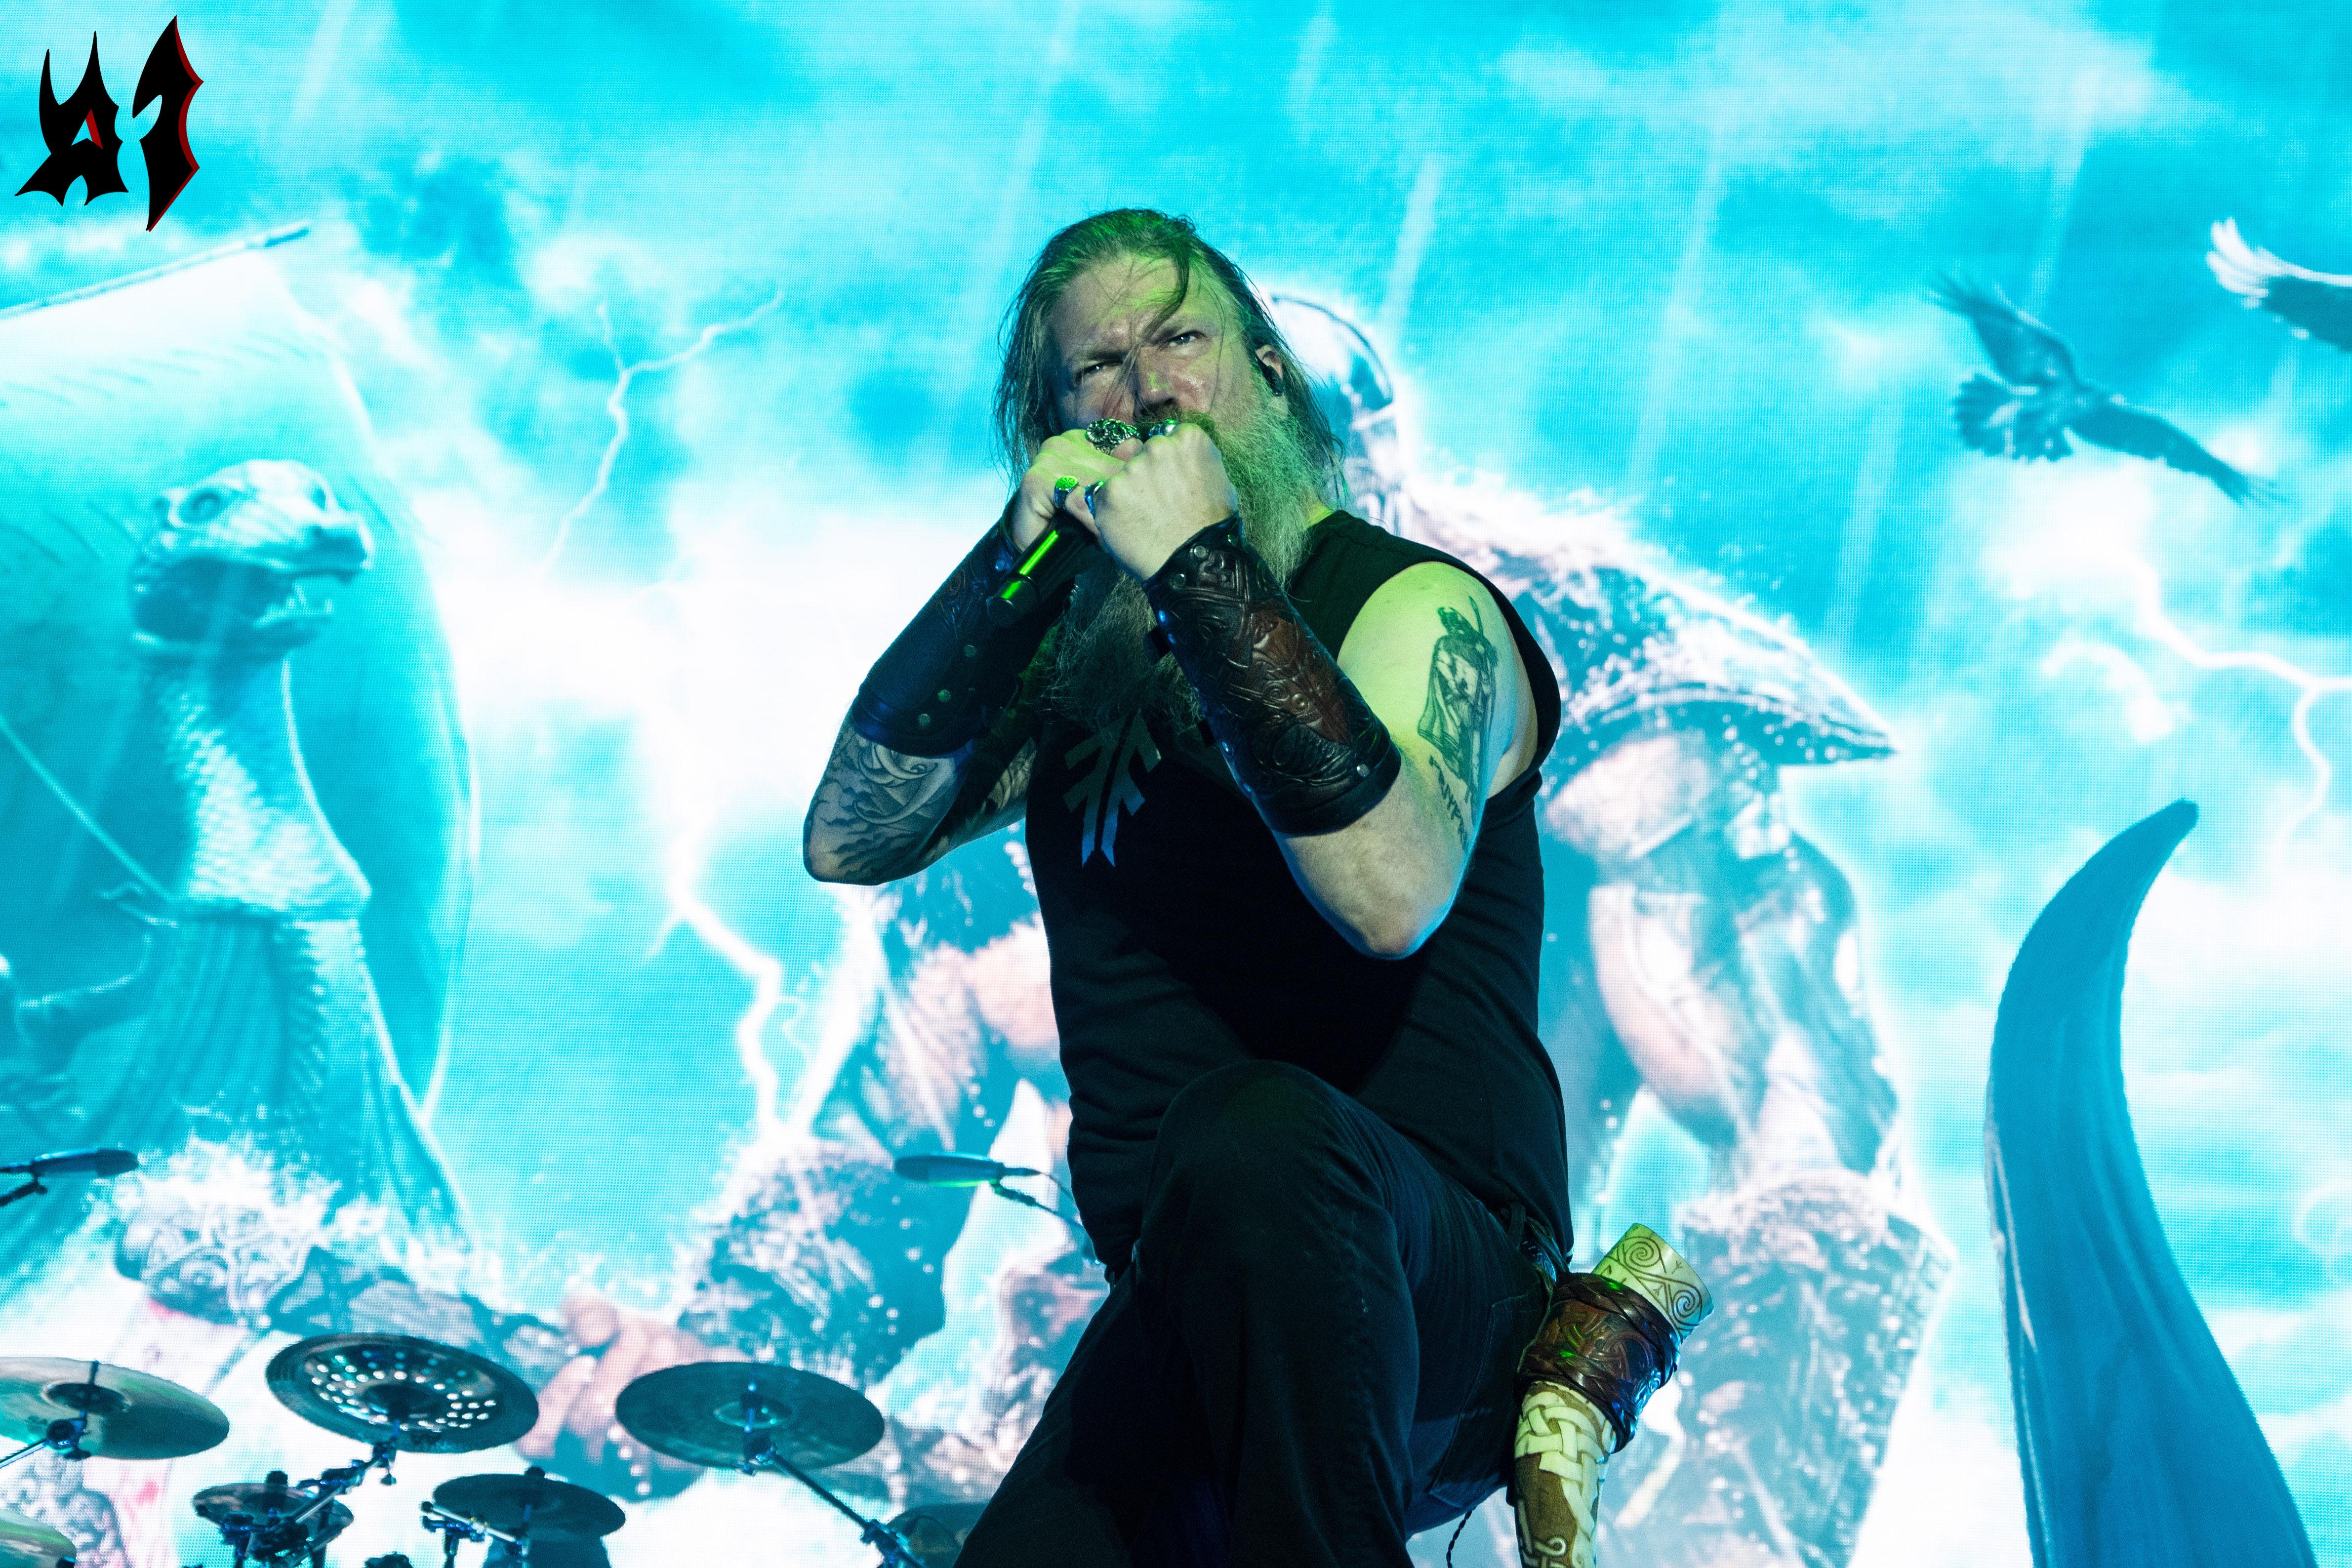 Knotfest - Amon Amarth - 2